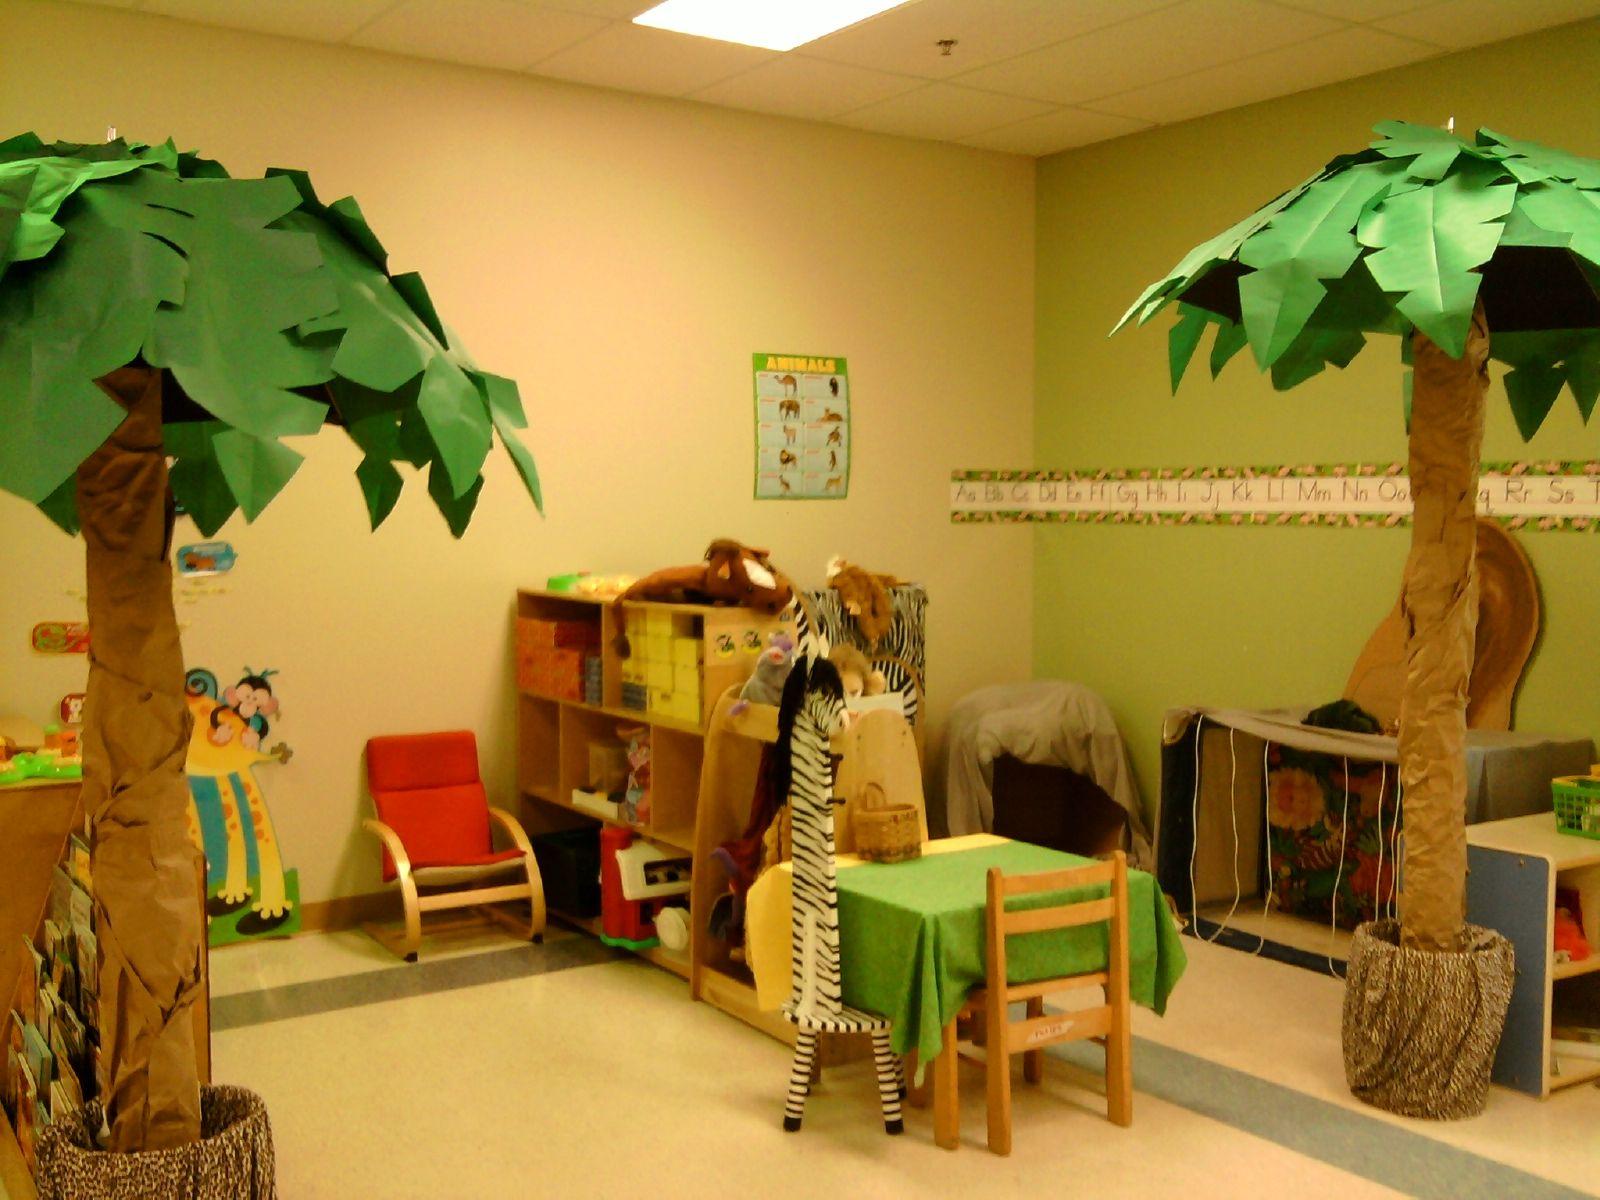 Zoo theme sunday school ideas pinterest - Home daycare ideas for decorating ideas ...